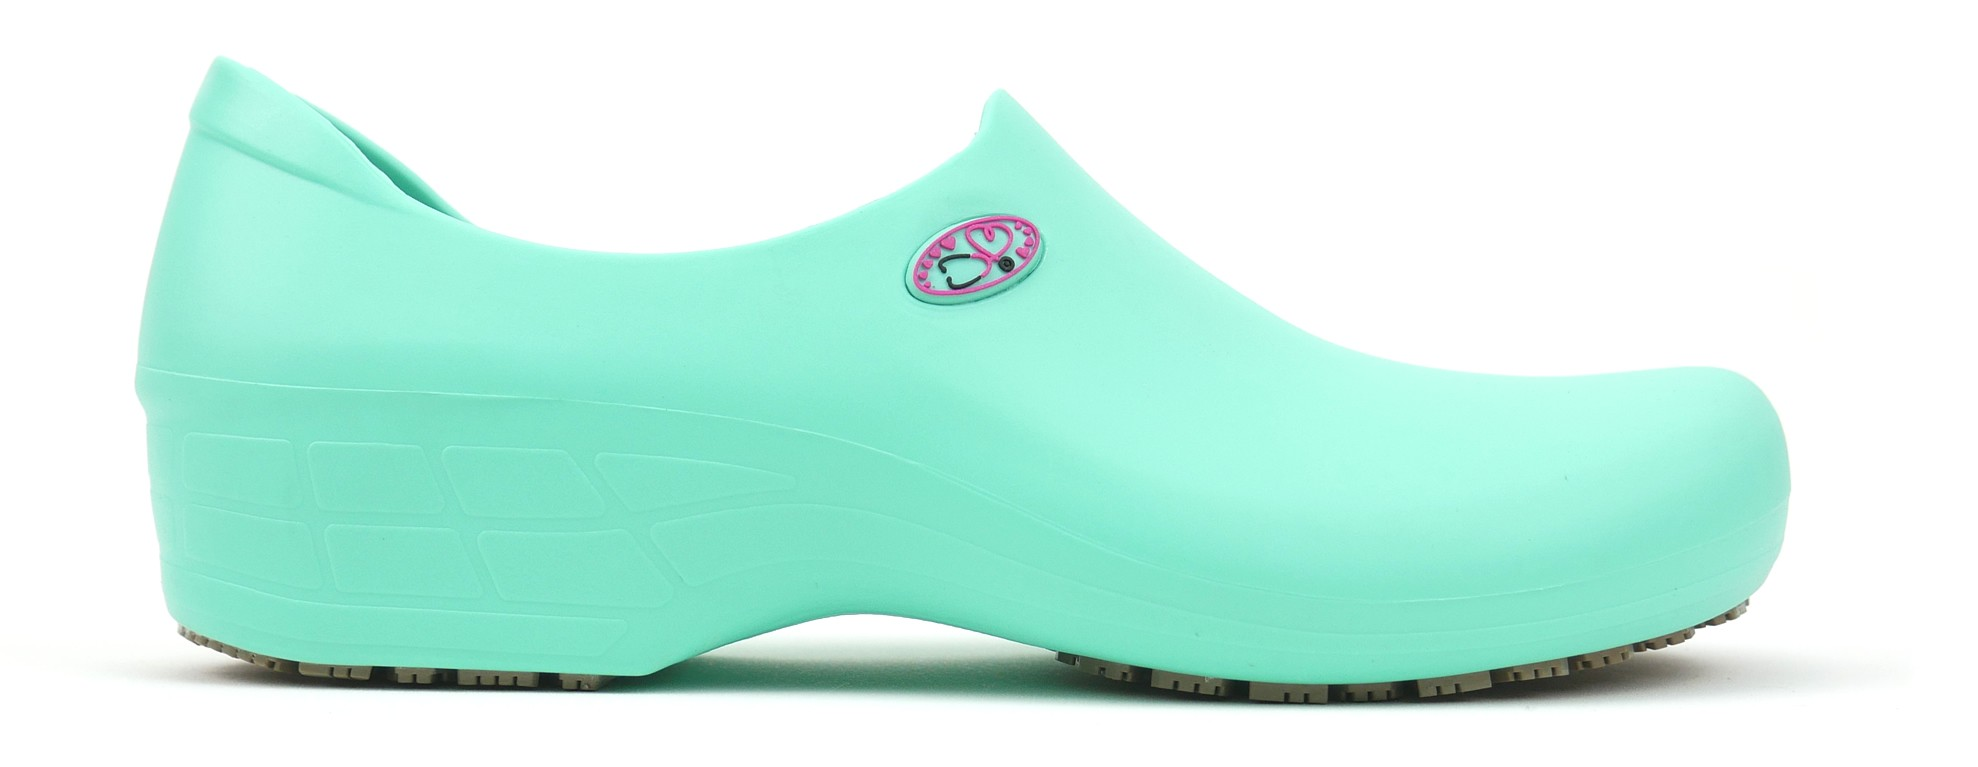 Non-Slip STICKY Shoes Stetho Love - Light Green/Pink